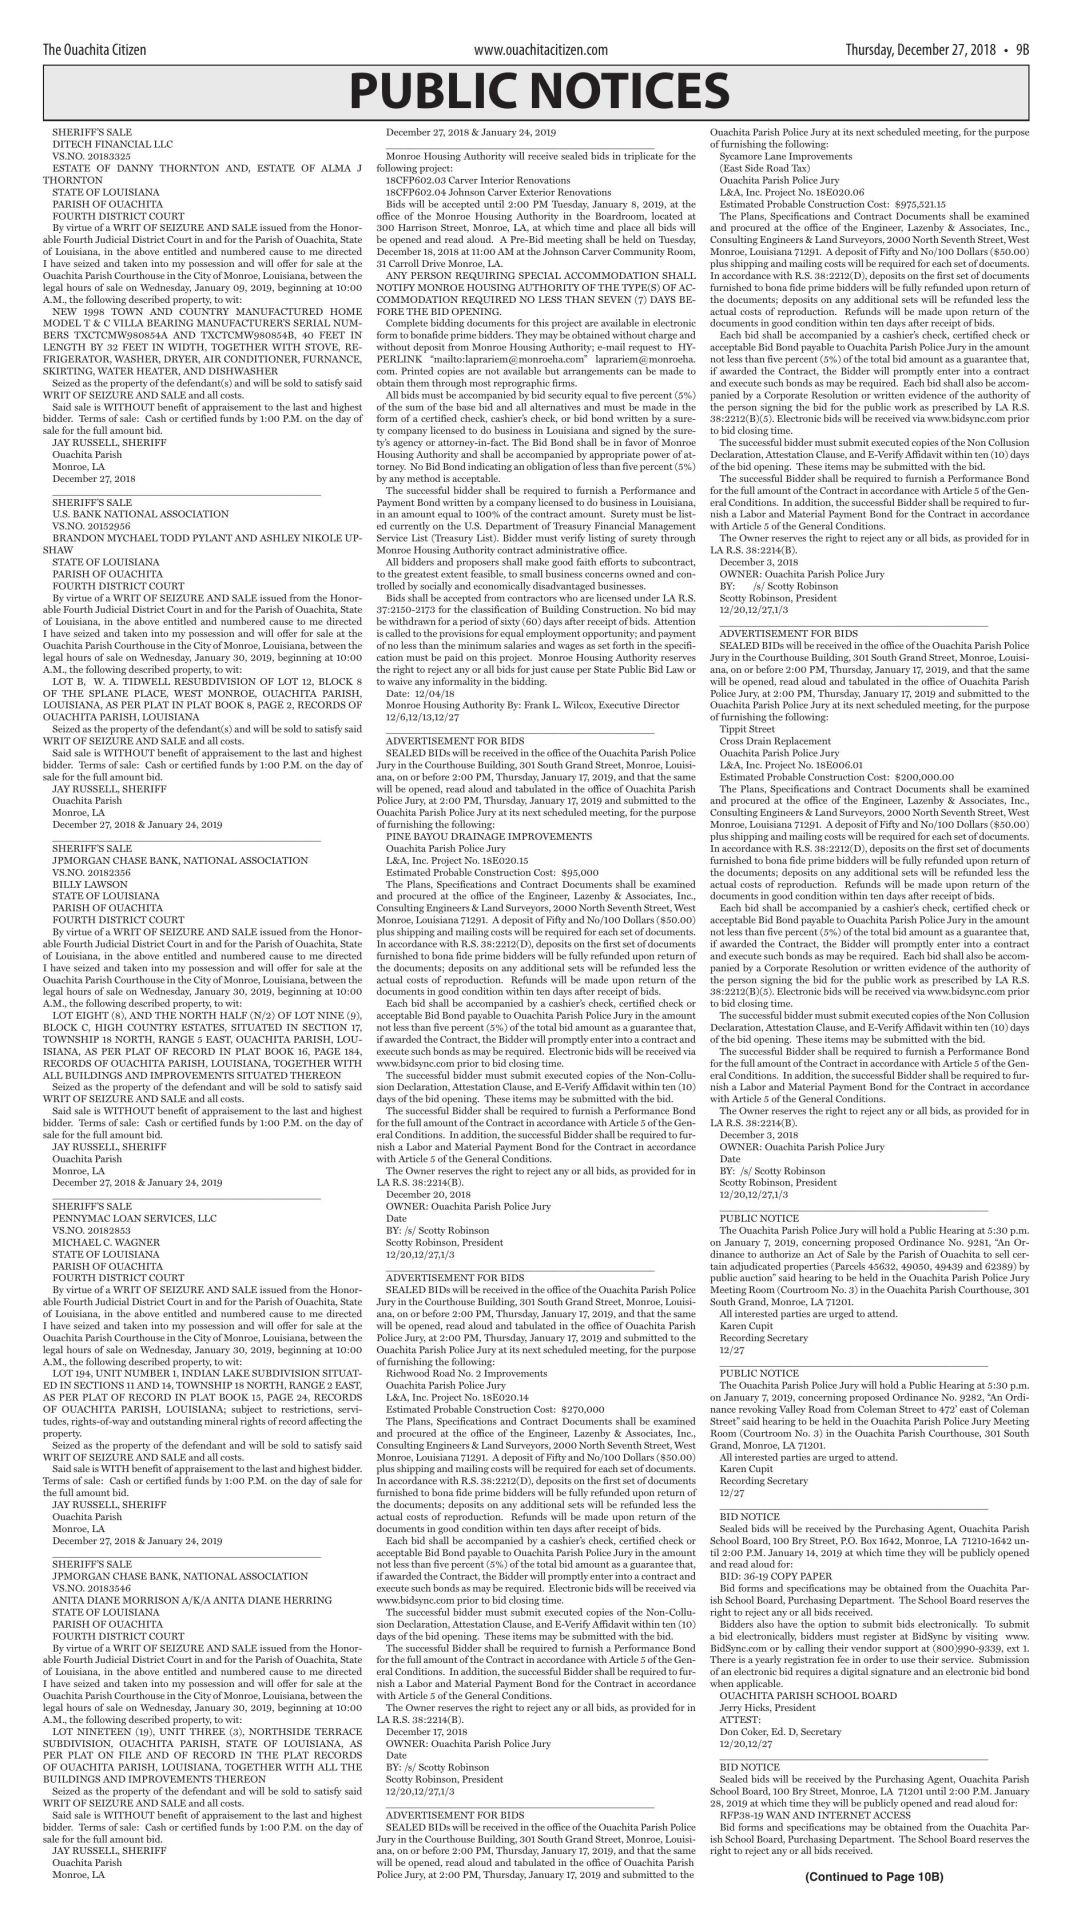 Dec. 27, 2018 Public Notices, click to download pages